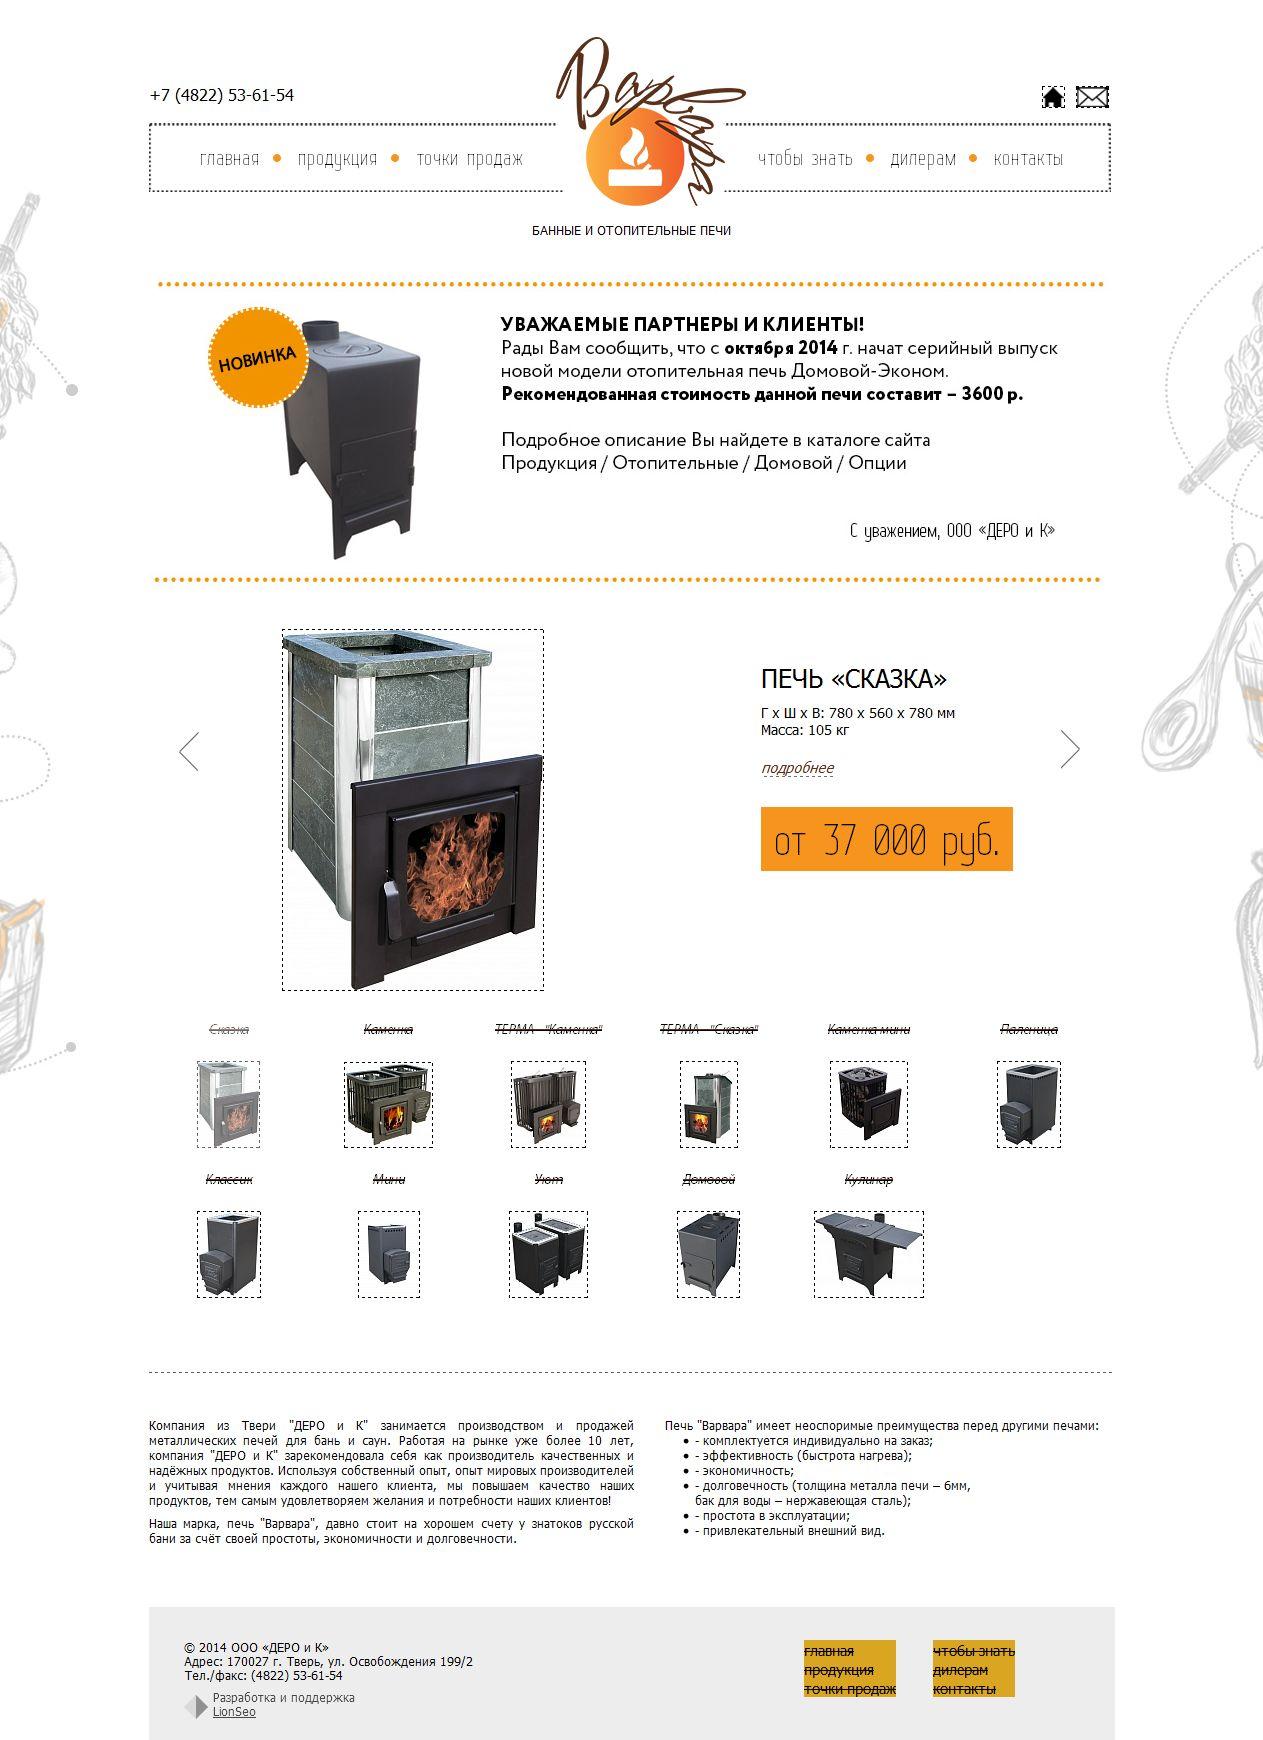 pech-varvara.ru - продажа печей